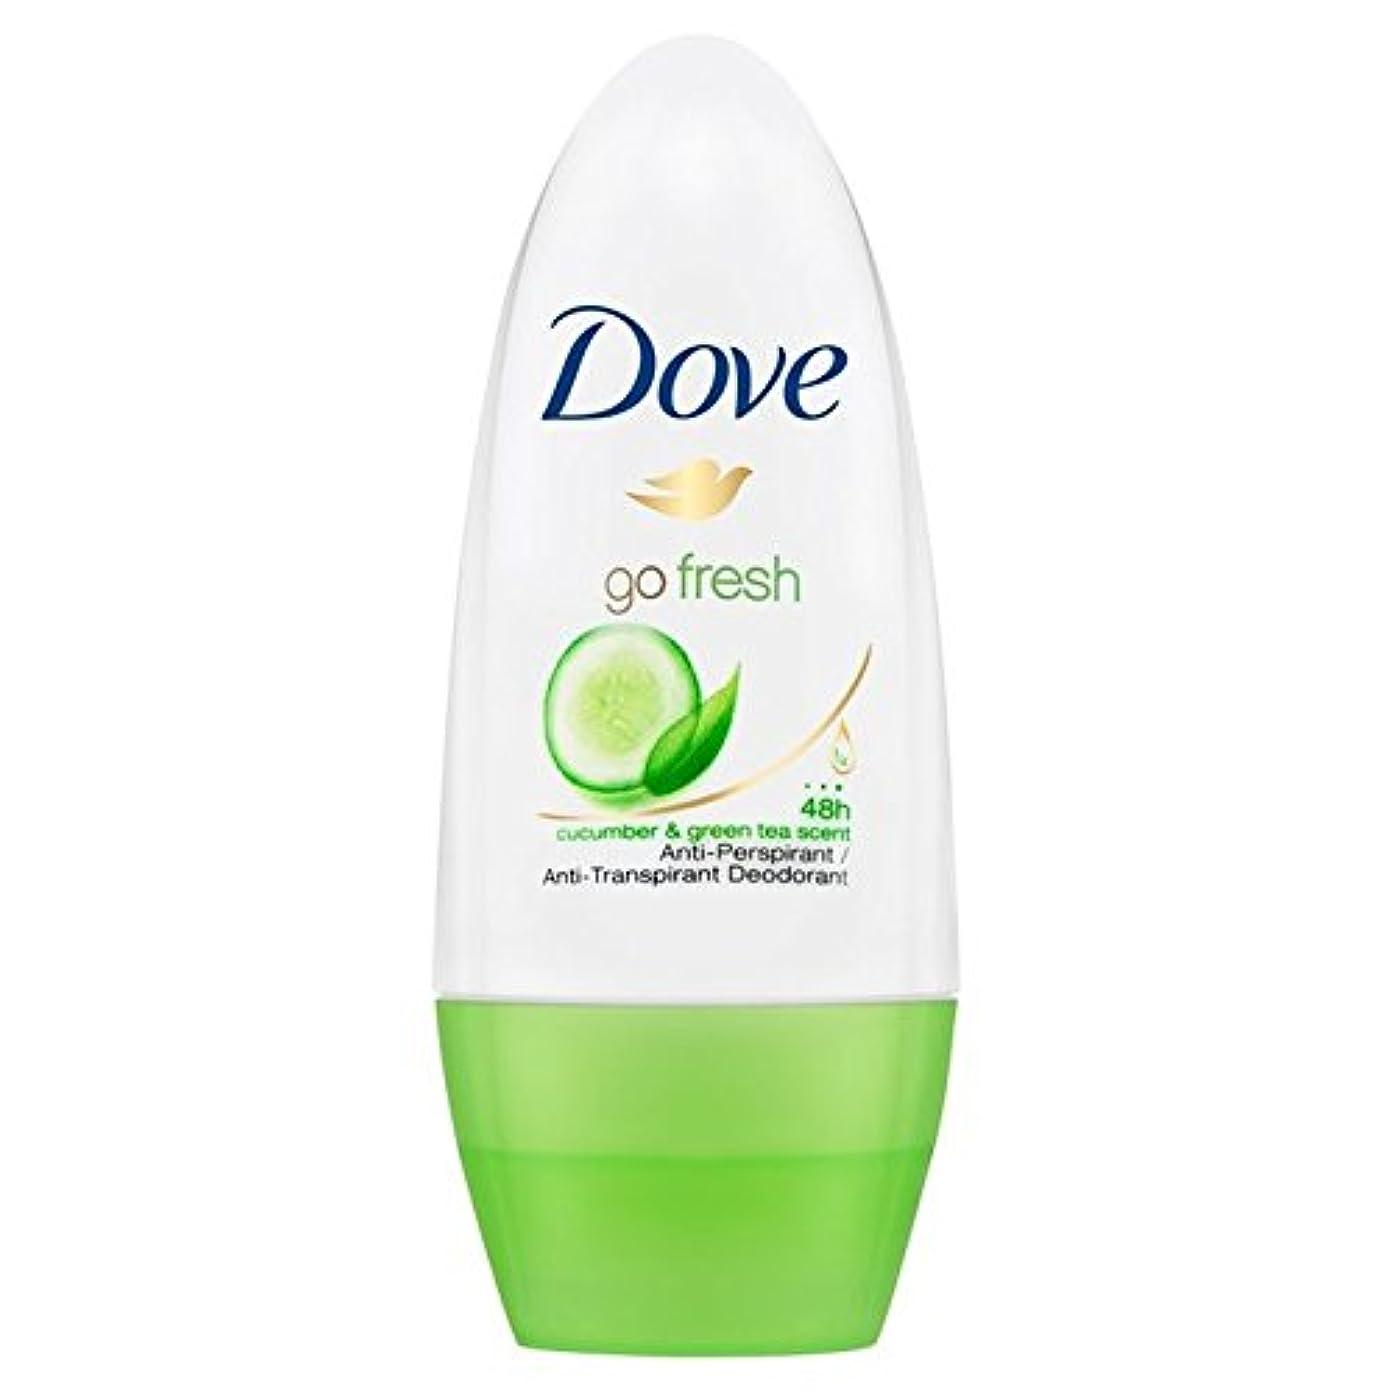 Dove Go Fresh Cucumber Roll-On Anti-Perspirant Deodorant 50ml - 新鮮なキュウリロールオン制汗デオドラント50ミリリットルを行く鳩 [並行輸入品]